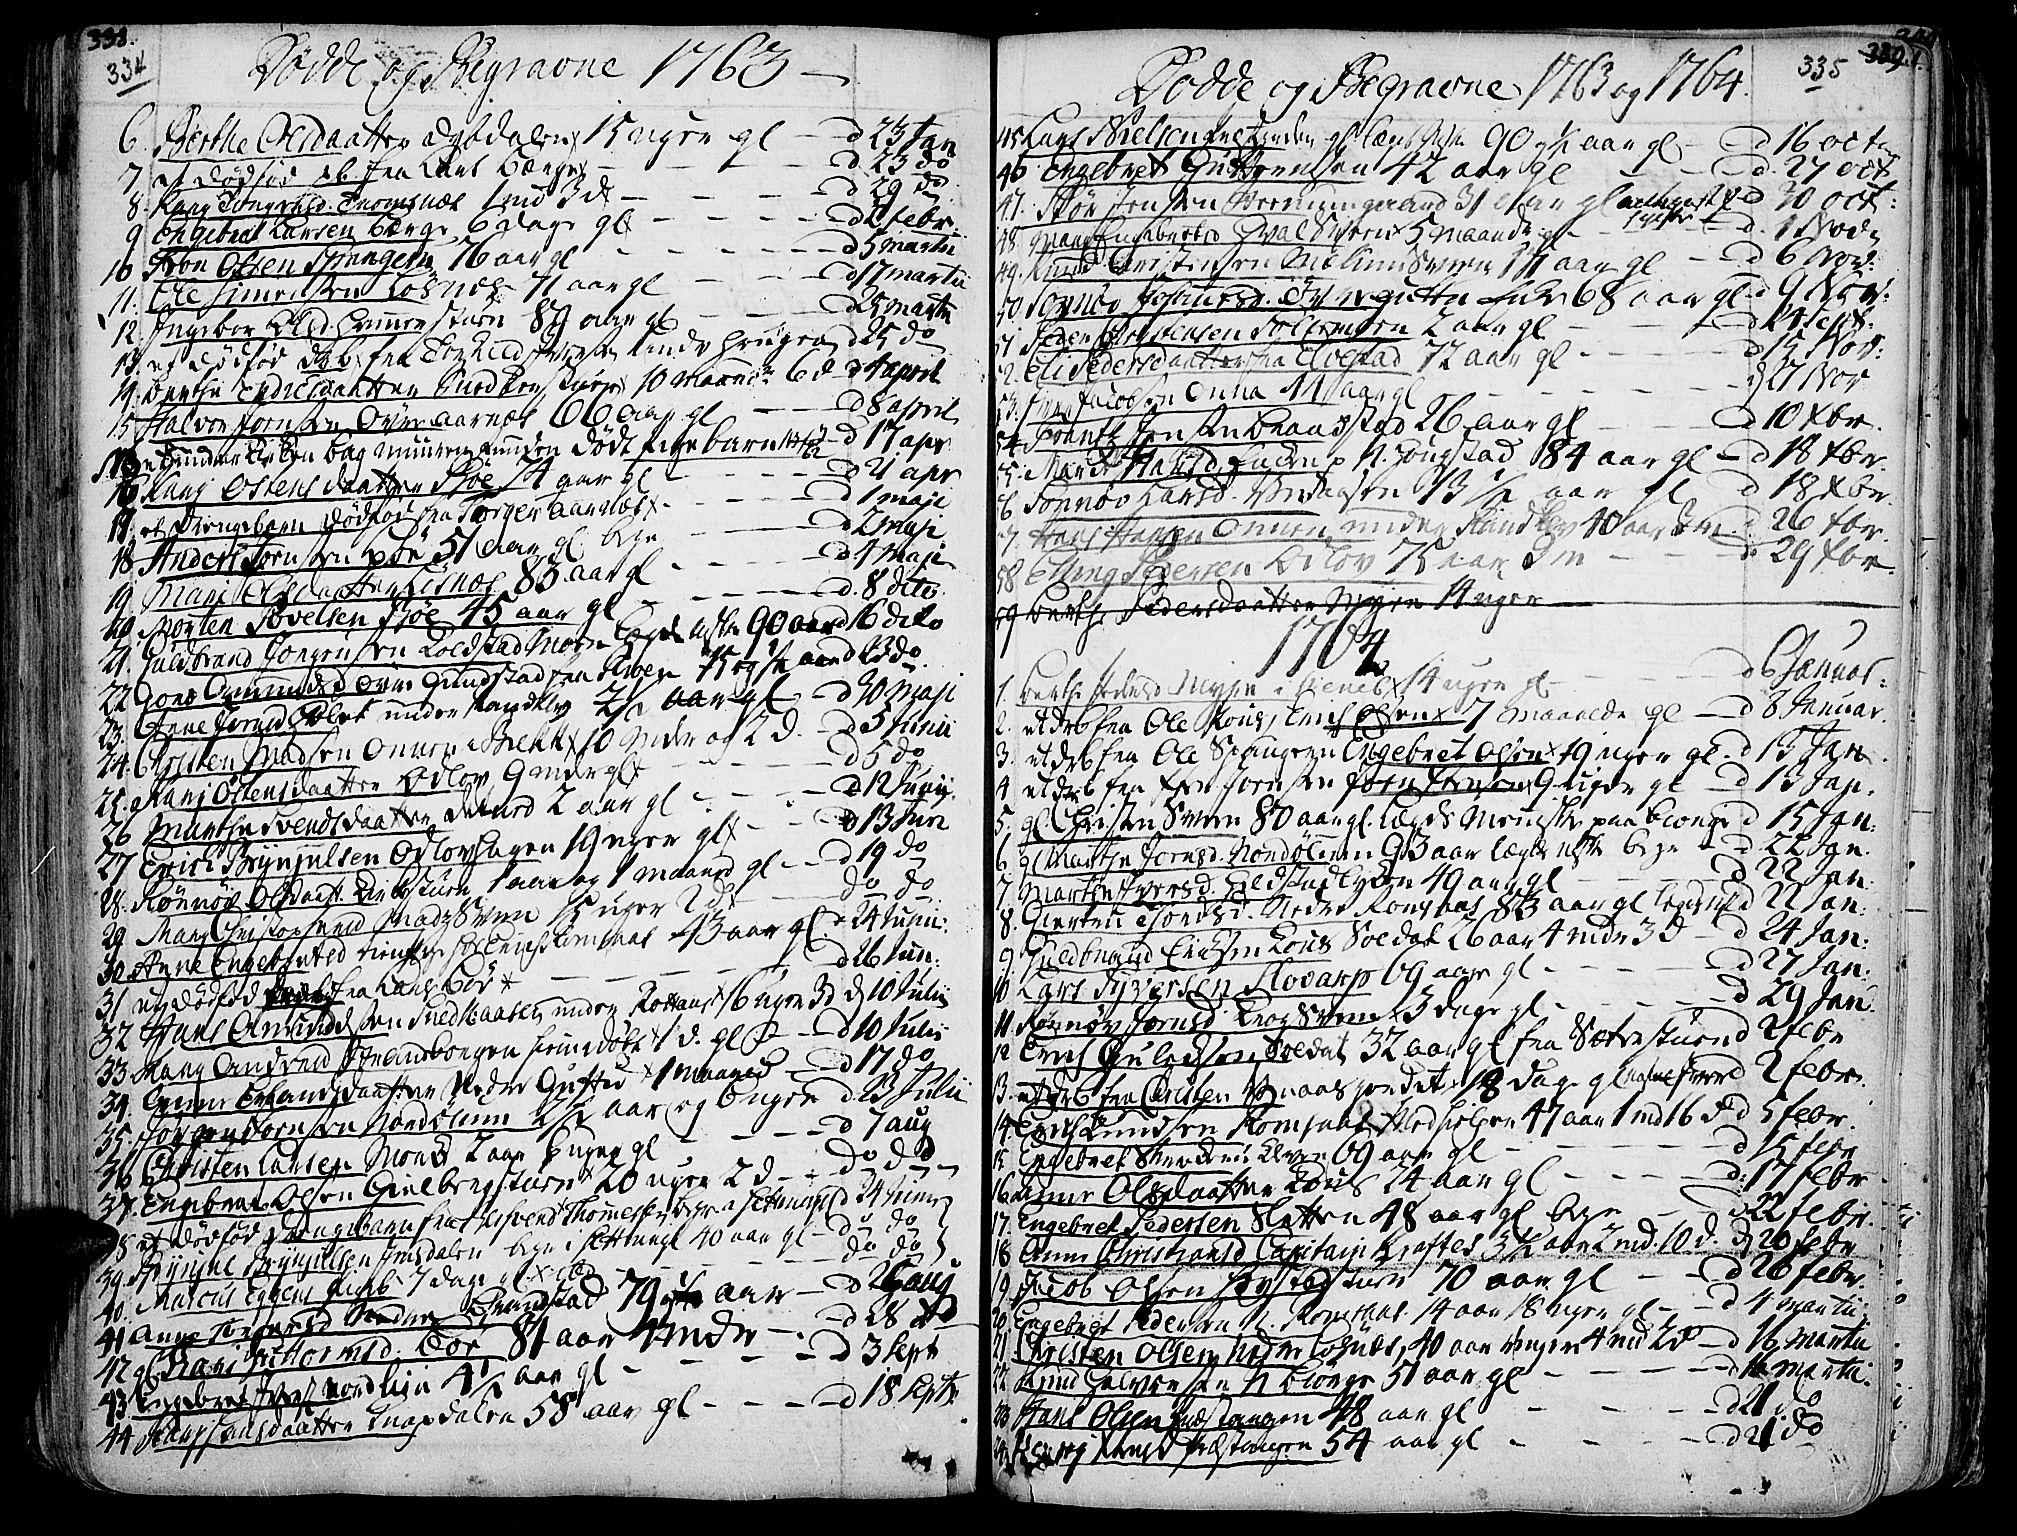 SAH, Ringebu prestekontor, Ministerialbok nr. 2, 1734-1780, s. 334-335